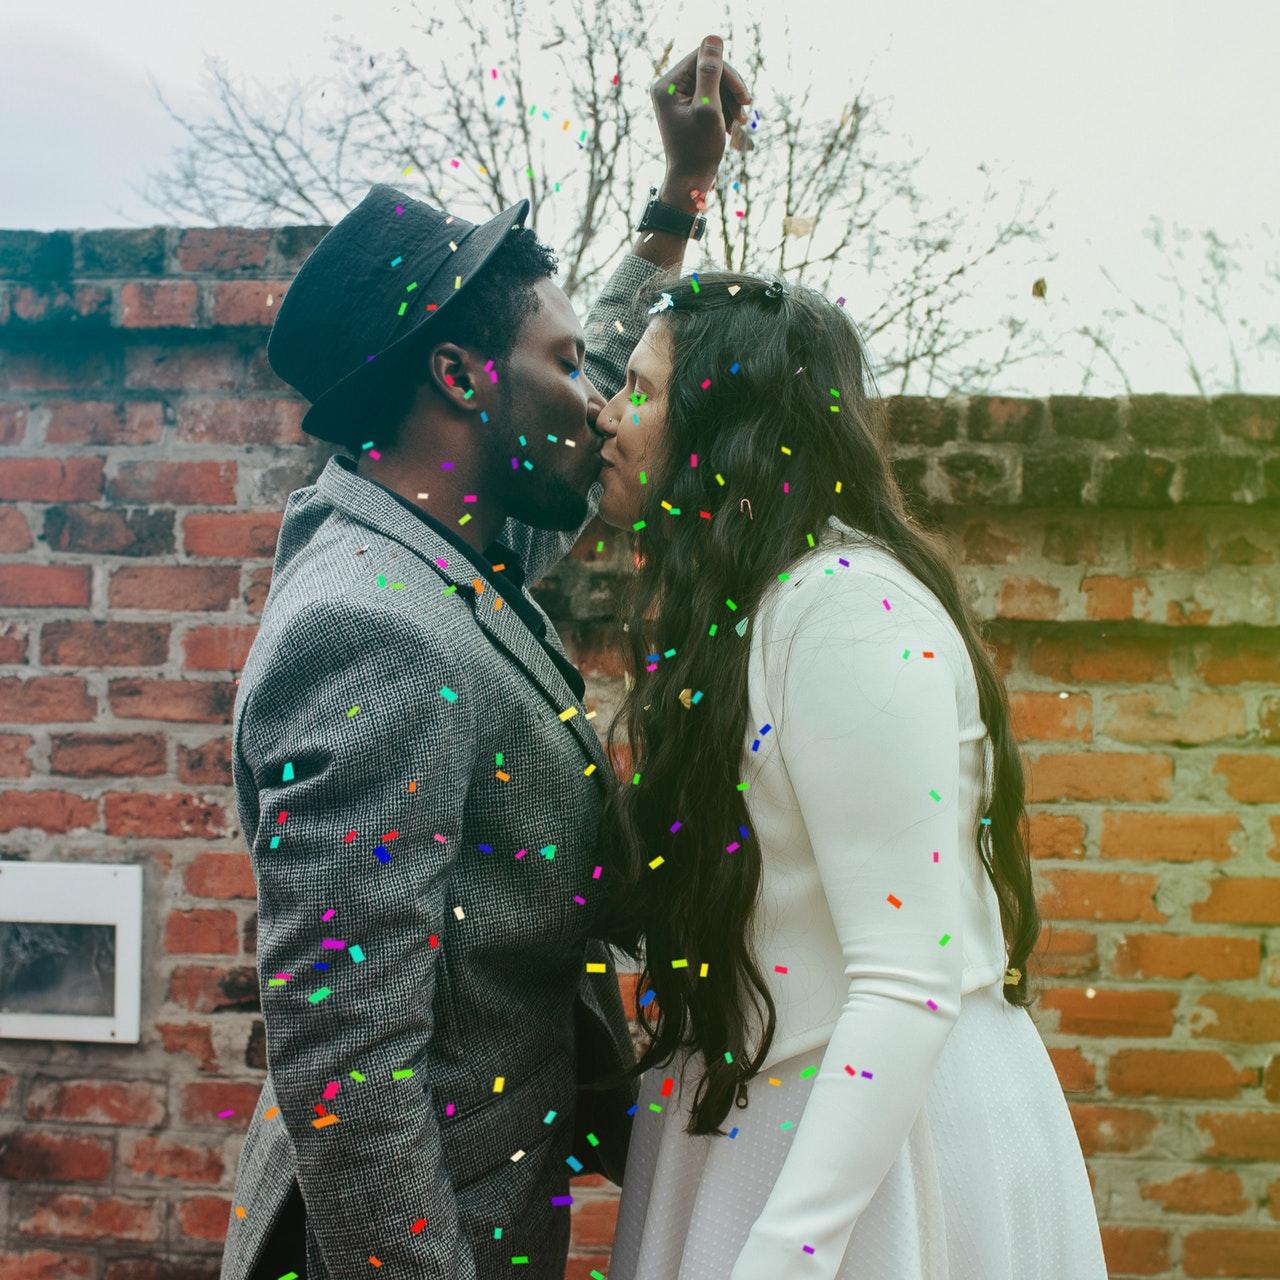 man-in-hat-kissing-woman-in-white-dress-